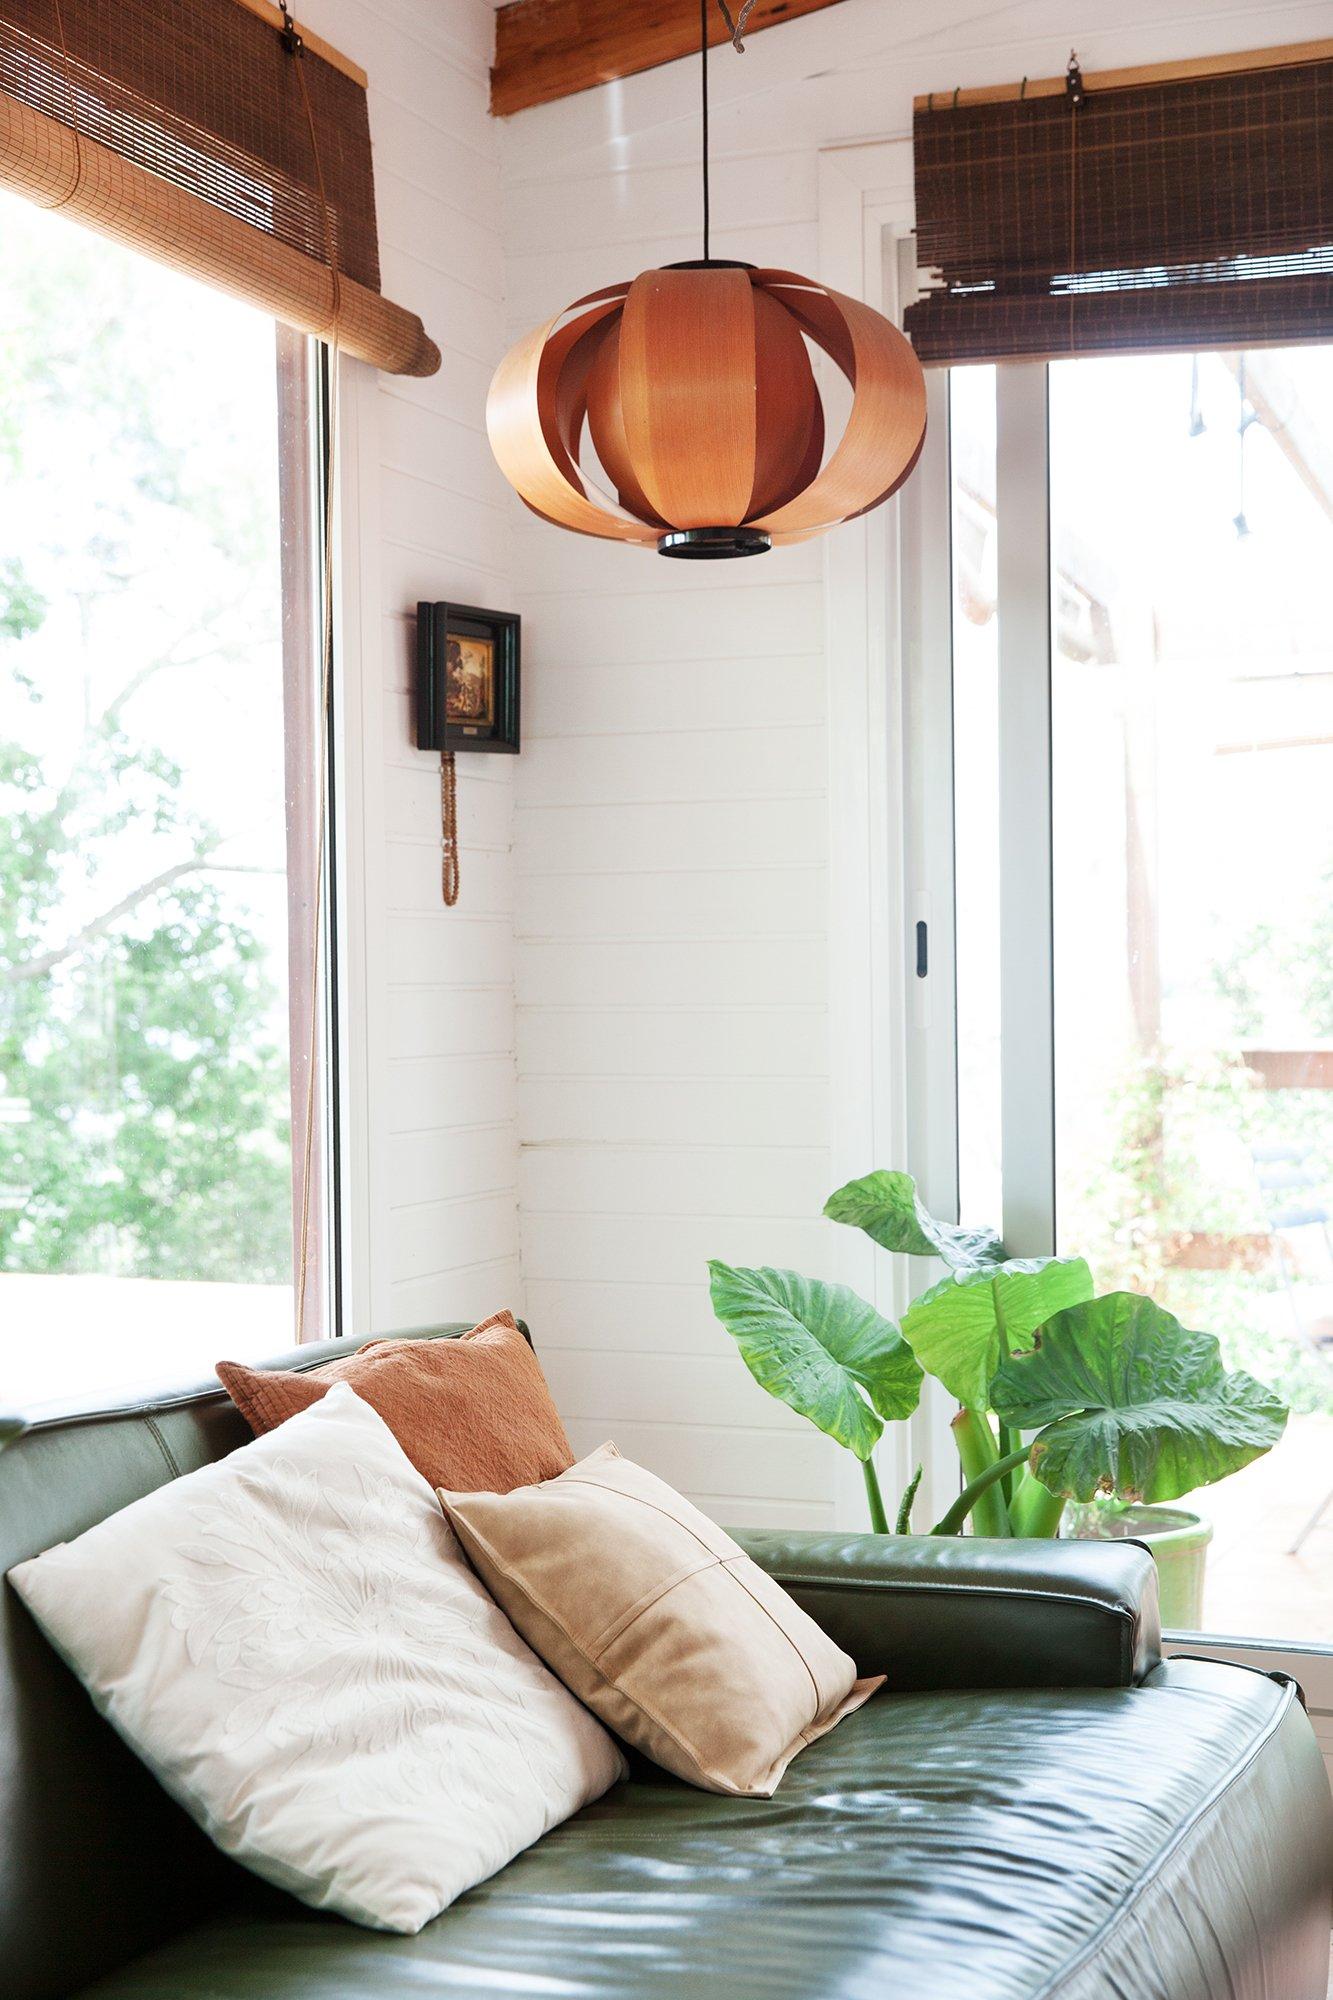 lampe paola navone hermesstore with lampe paola navone gallery of lampe suspension en verre de. Black Bedroom Furniture Sets. Home Design Ideas